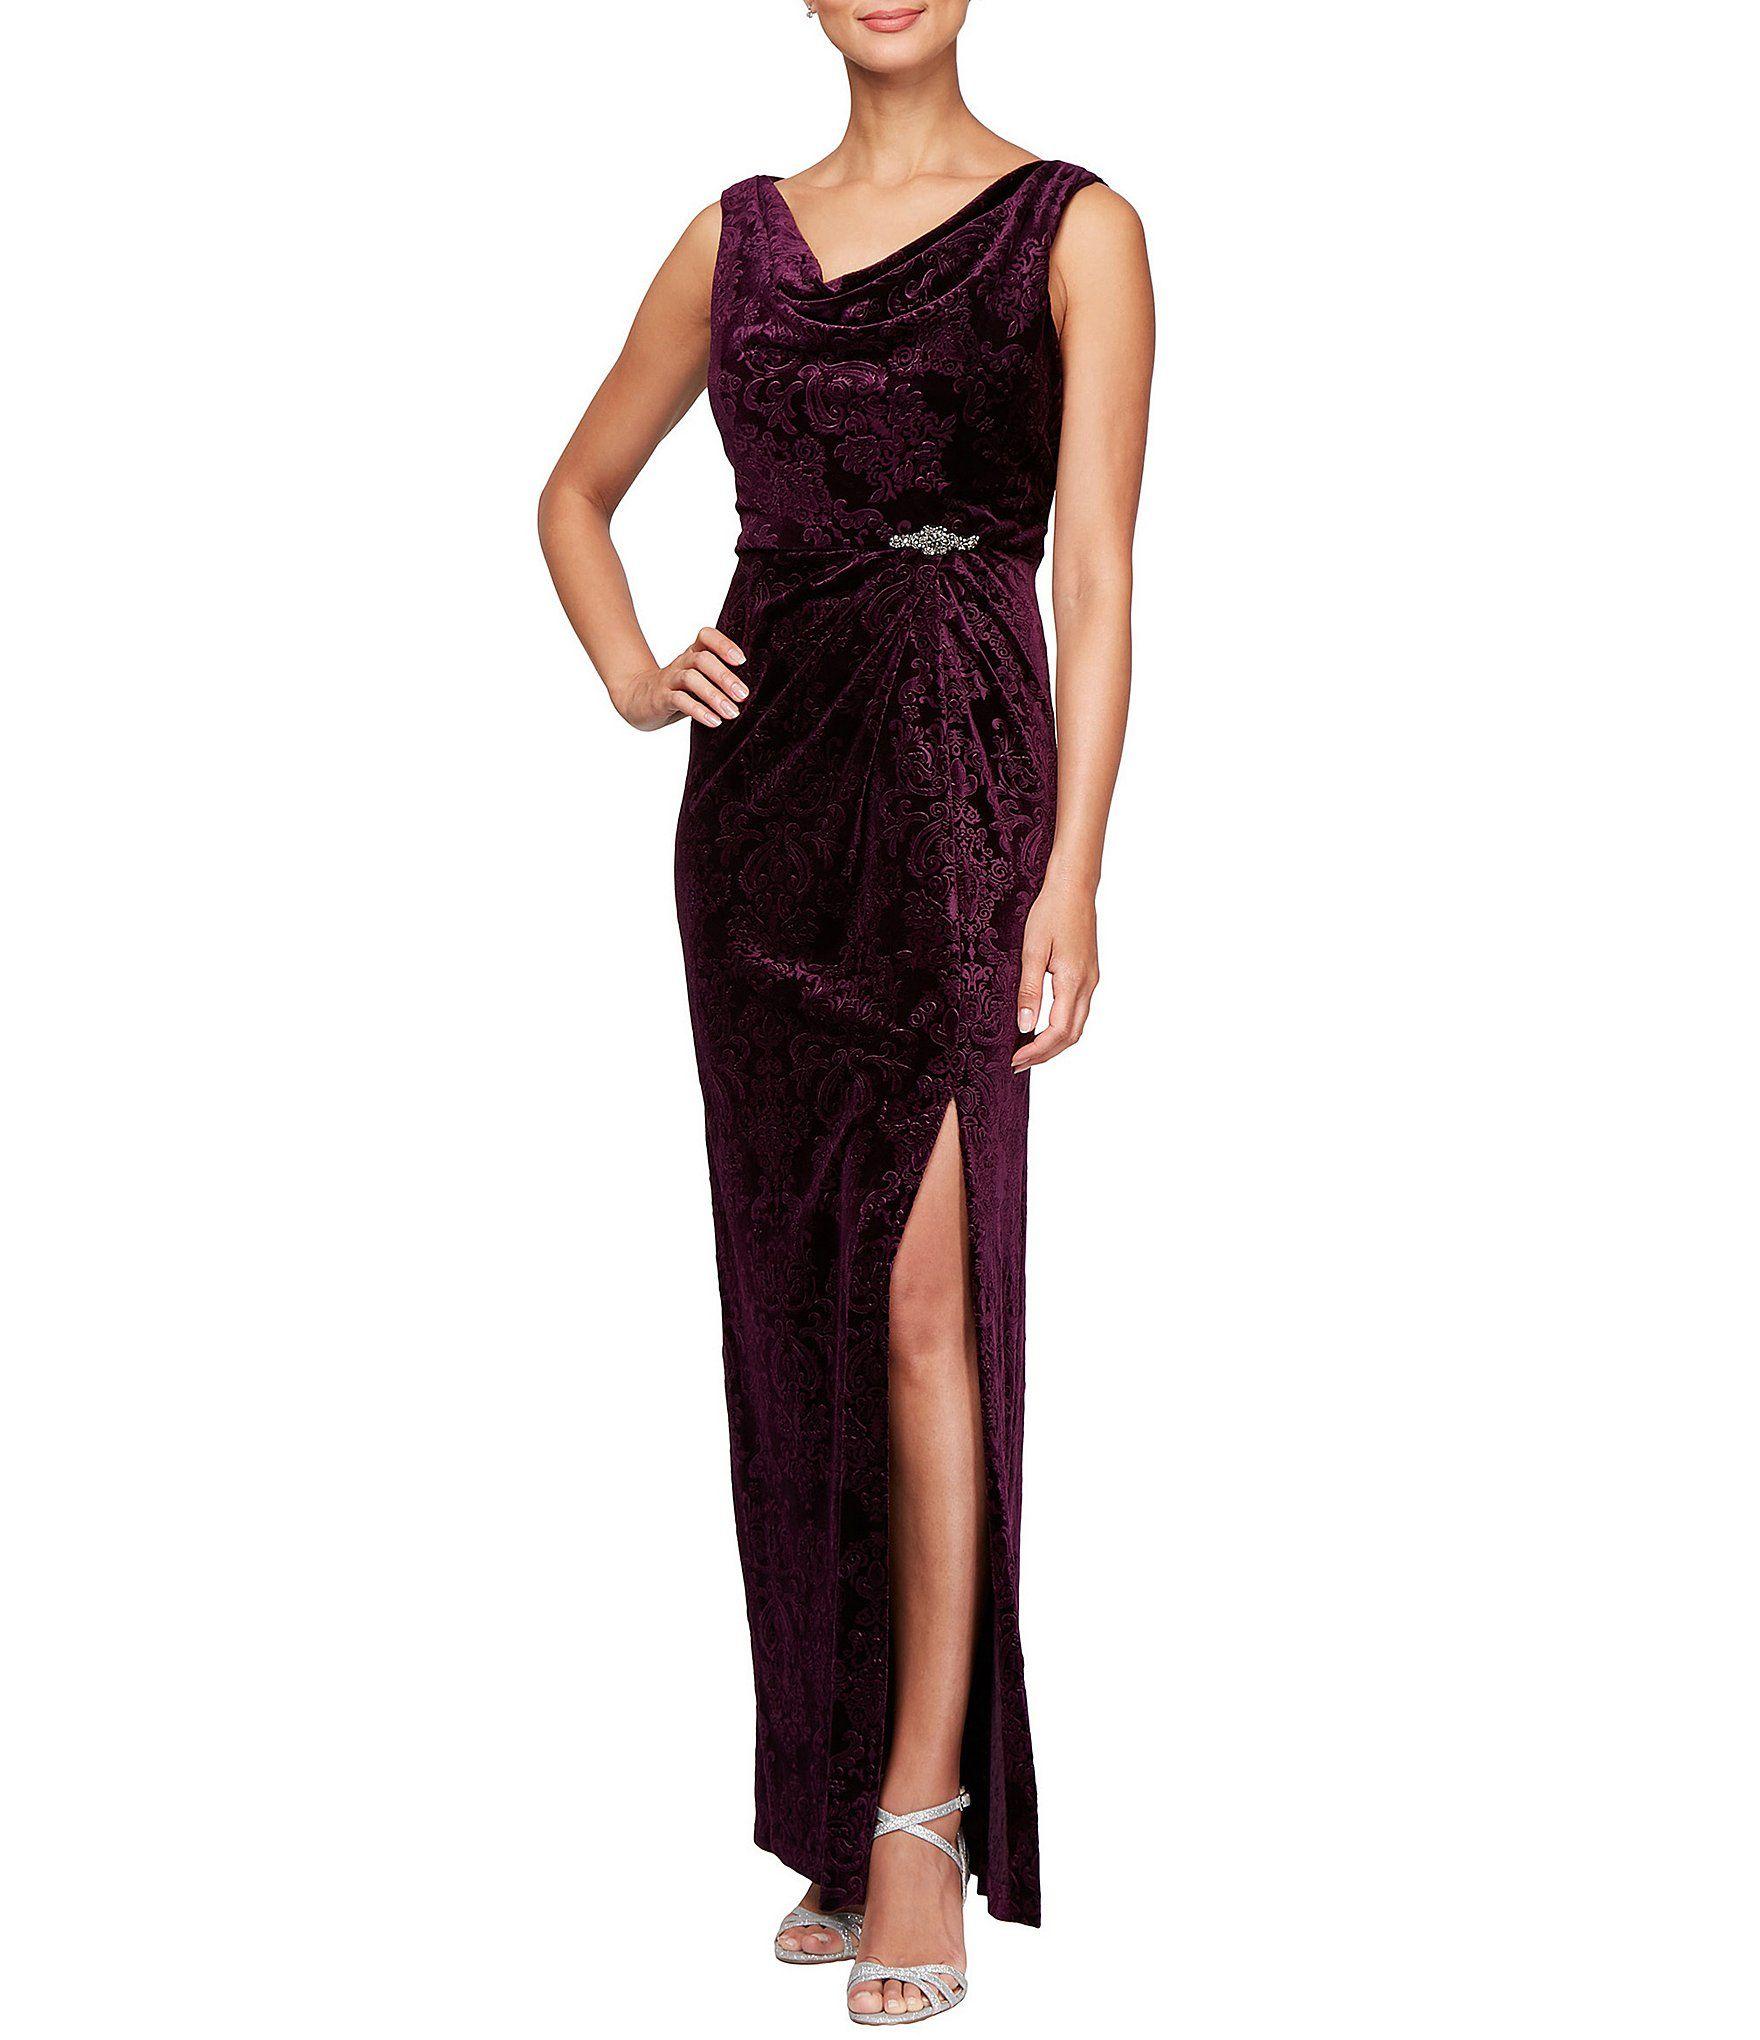 706a7be9b283 Alex Evenings Petite Long Embossed Stretch Velvet Dress | Wedding ...